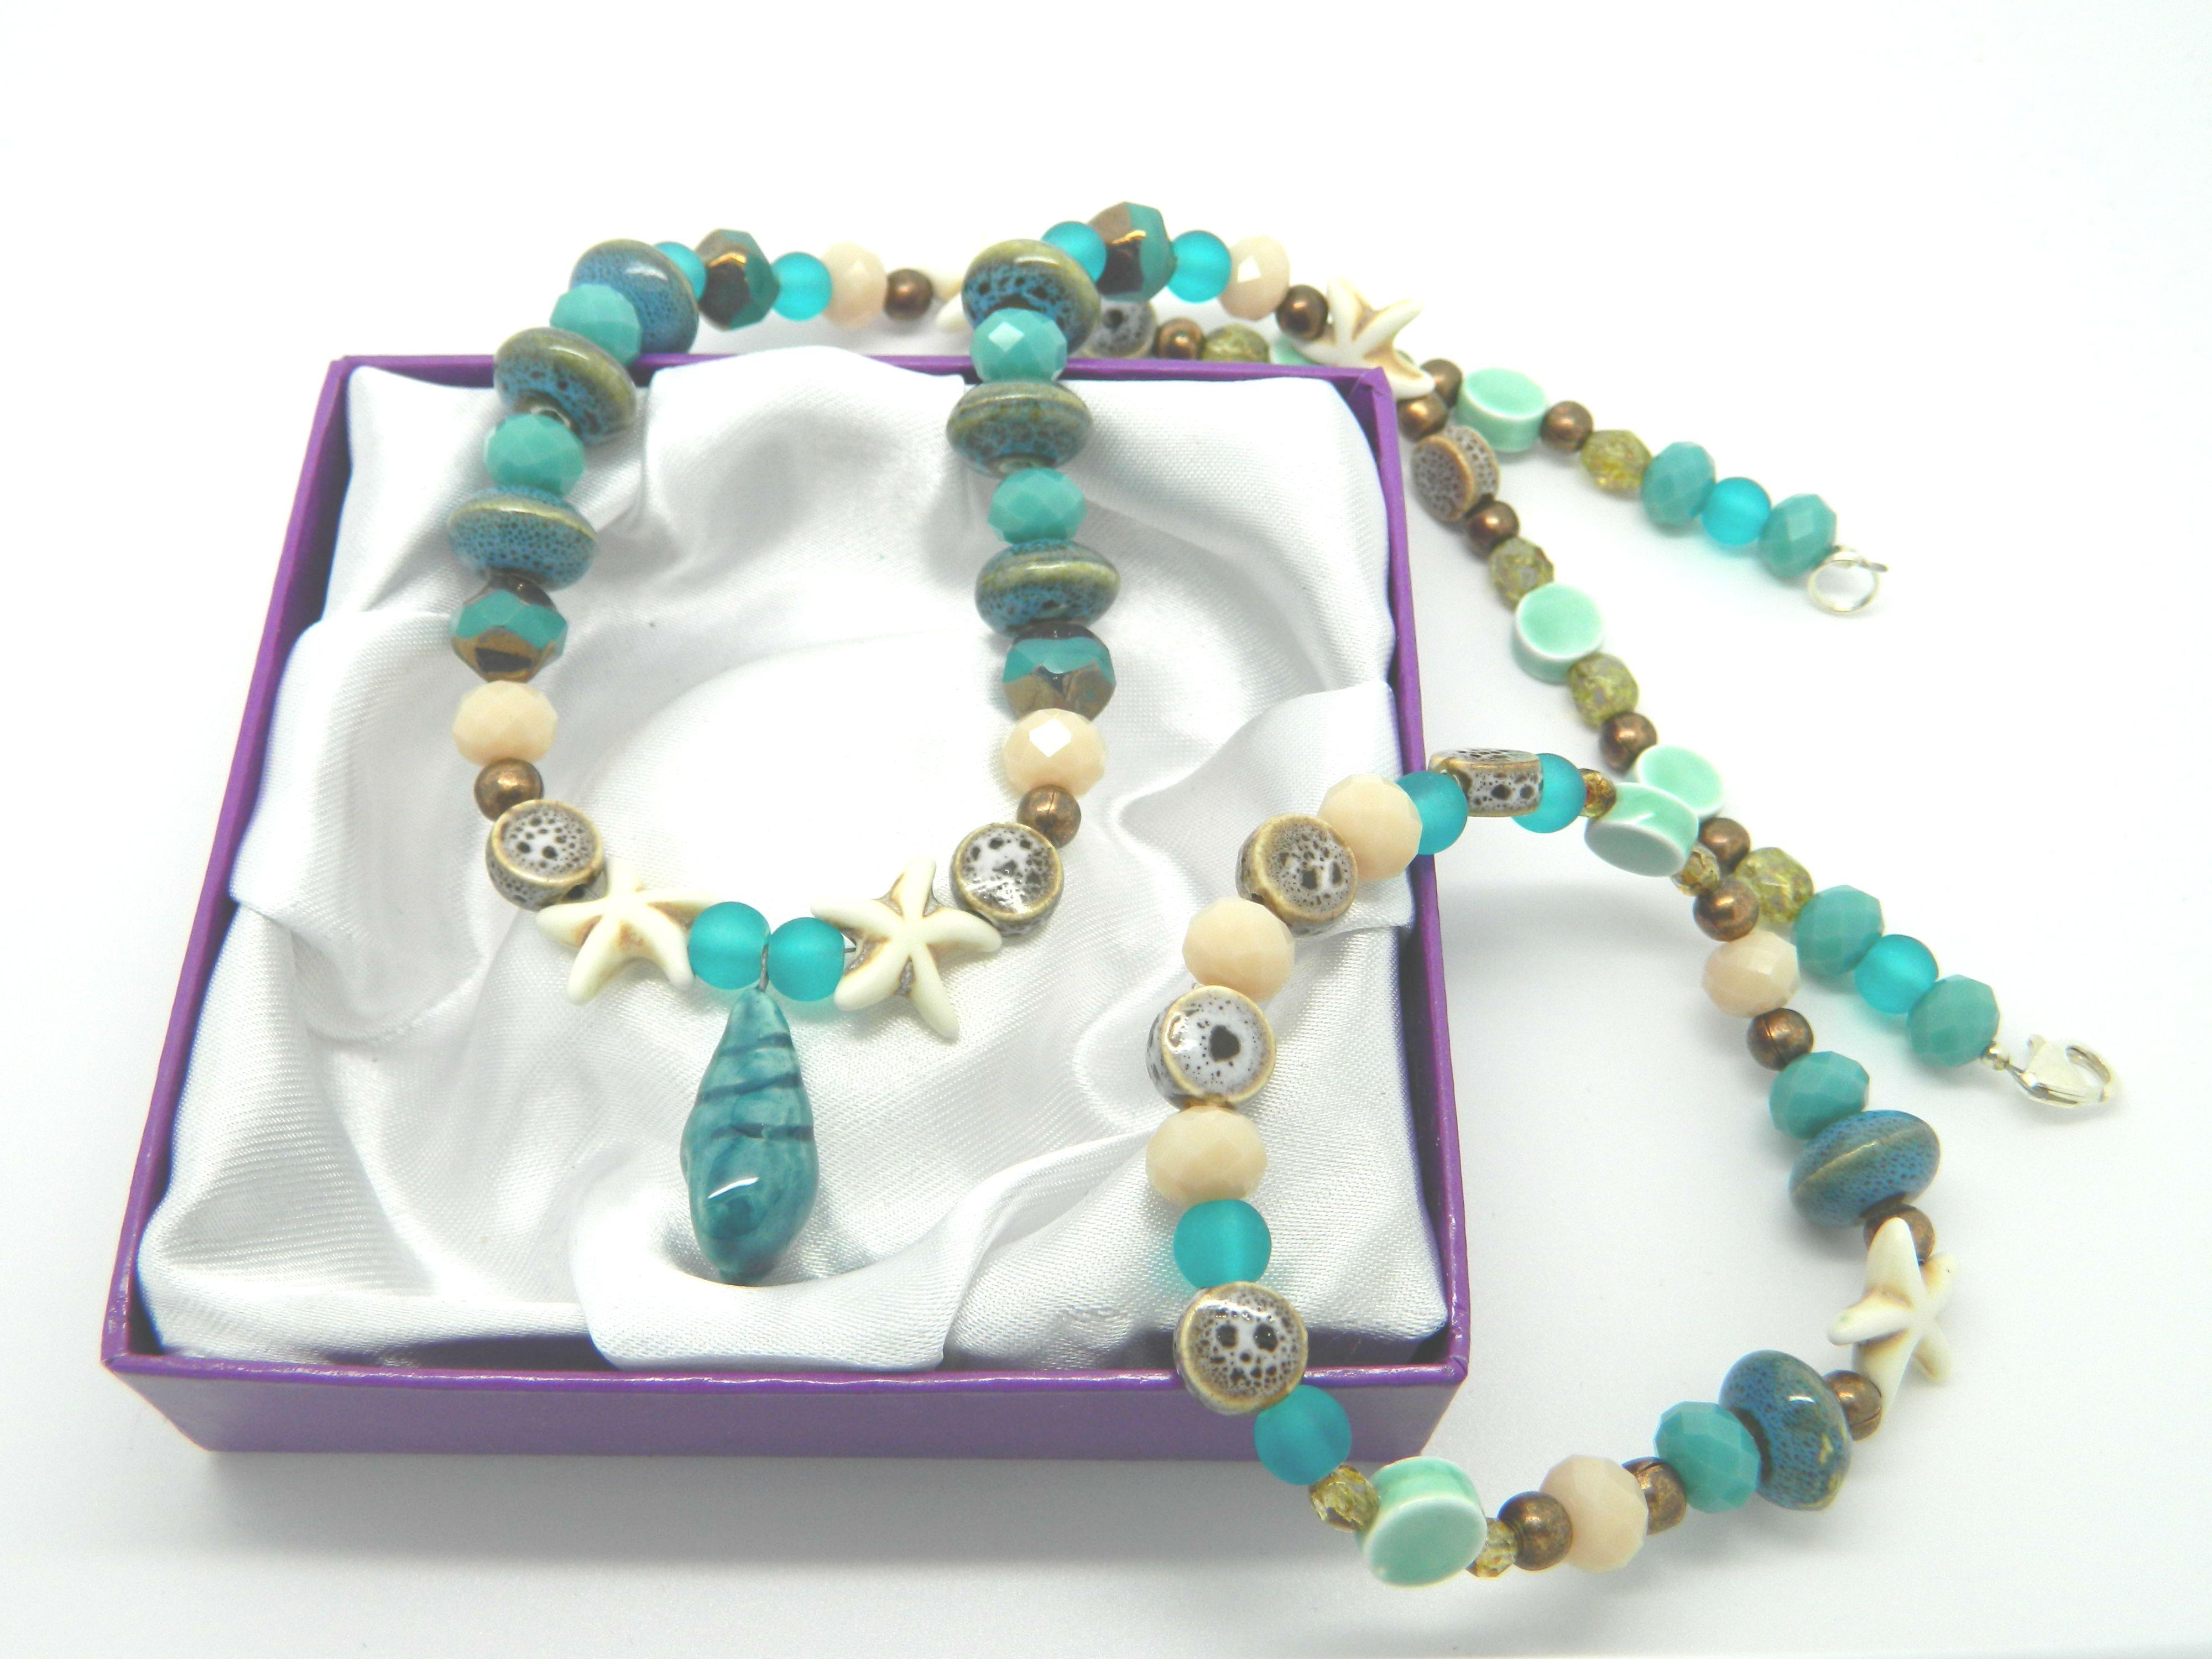 Sandy Shores inspiration bead pack necklace and bracelet set